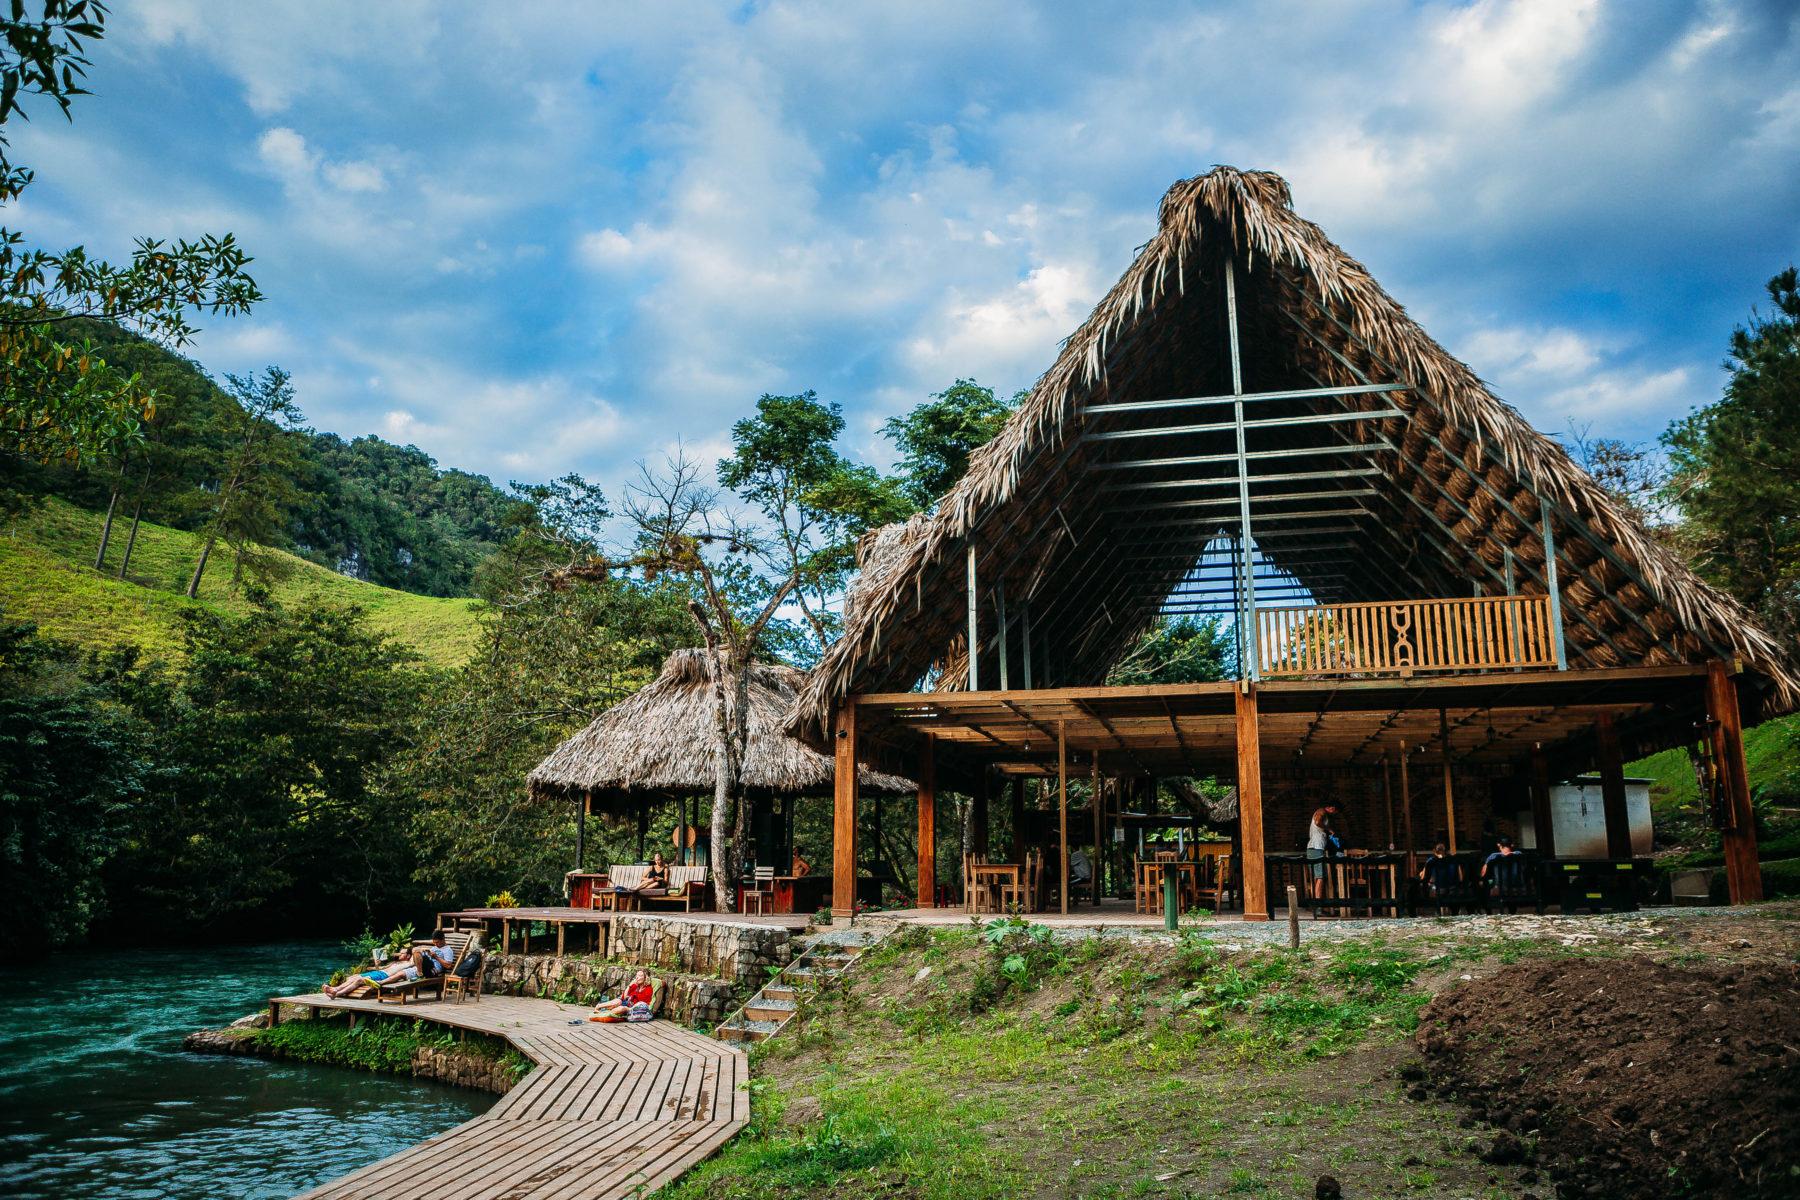 guatemala semuc champey turquoise pools jungle green humid swim adventure far away hidden paradise el retiro lodge in the jungle